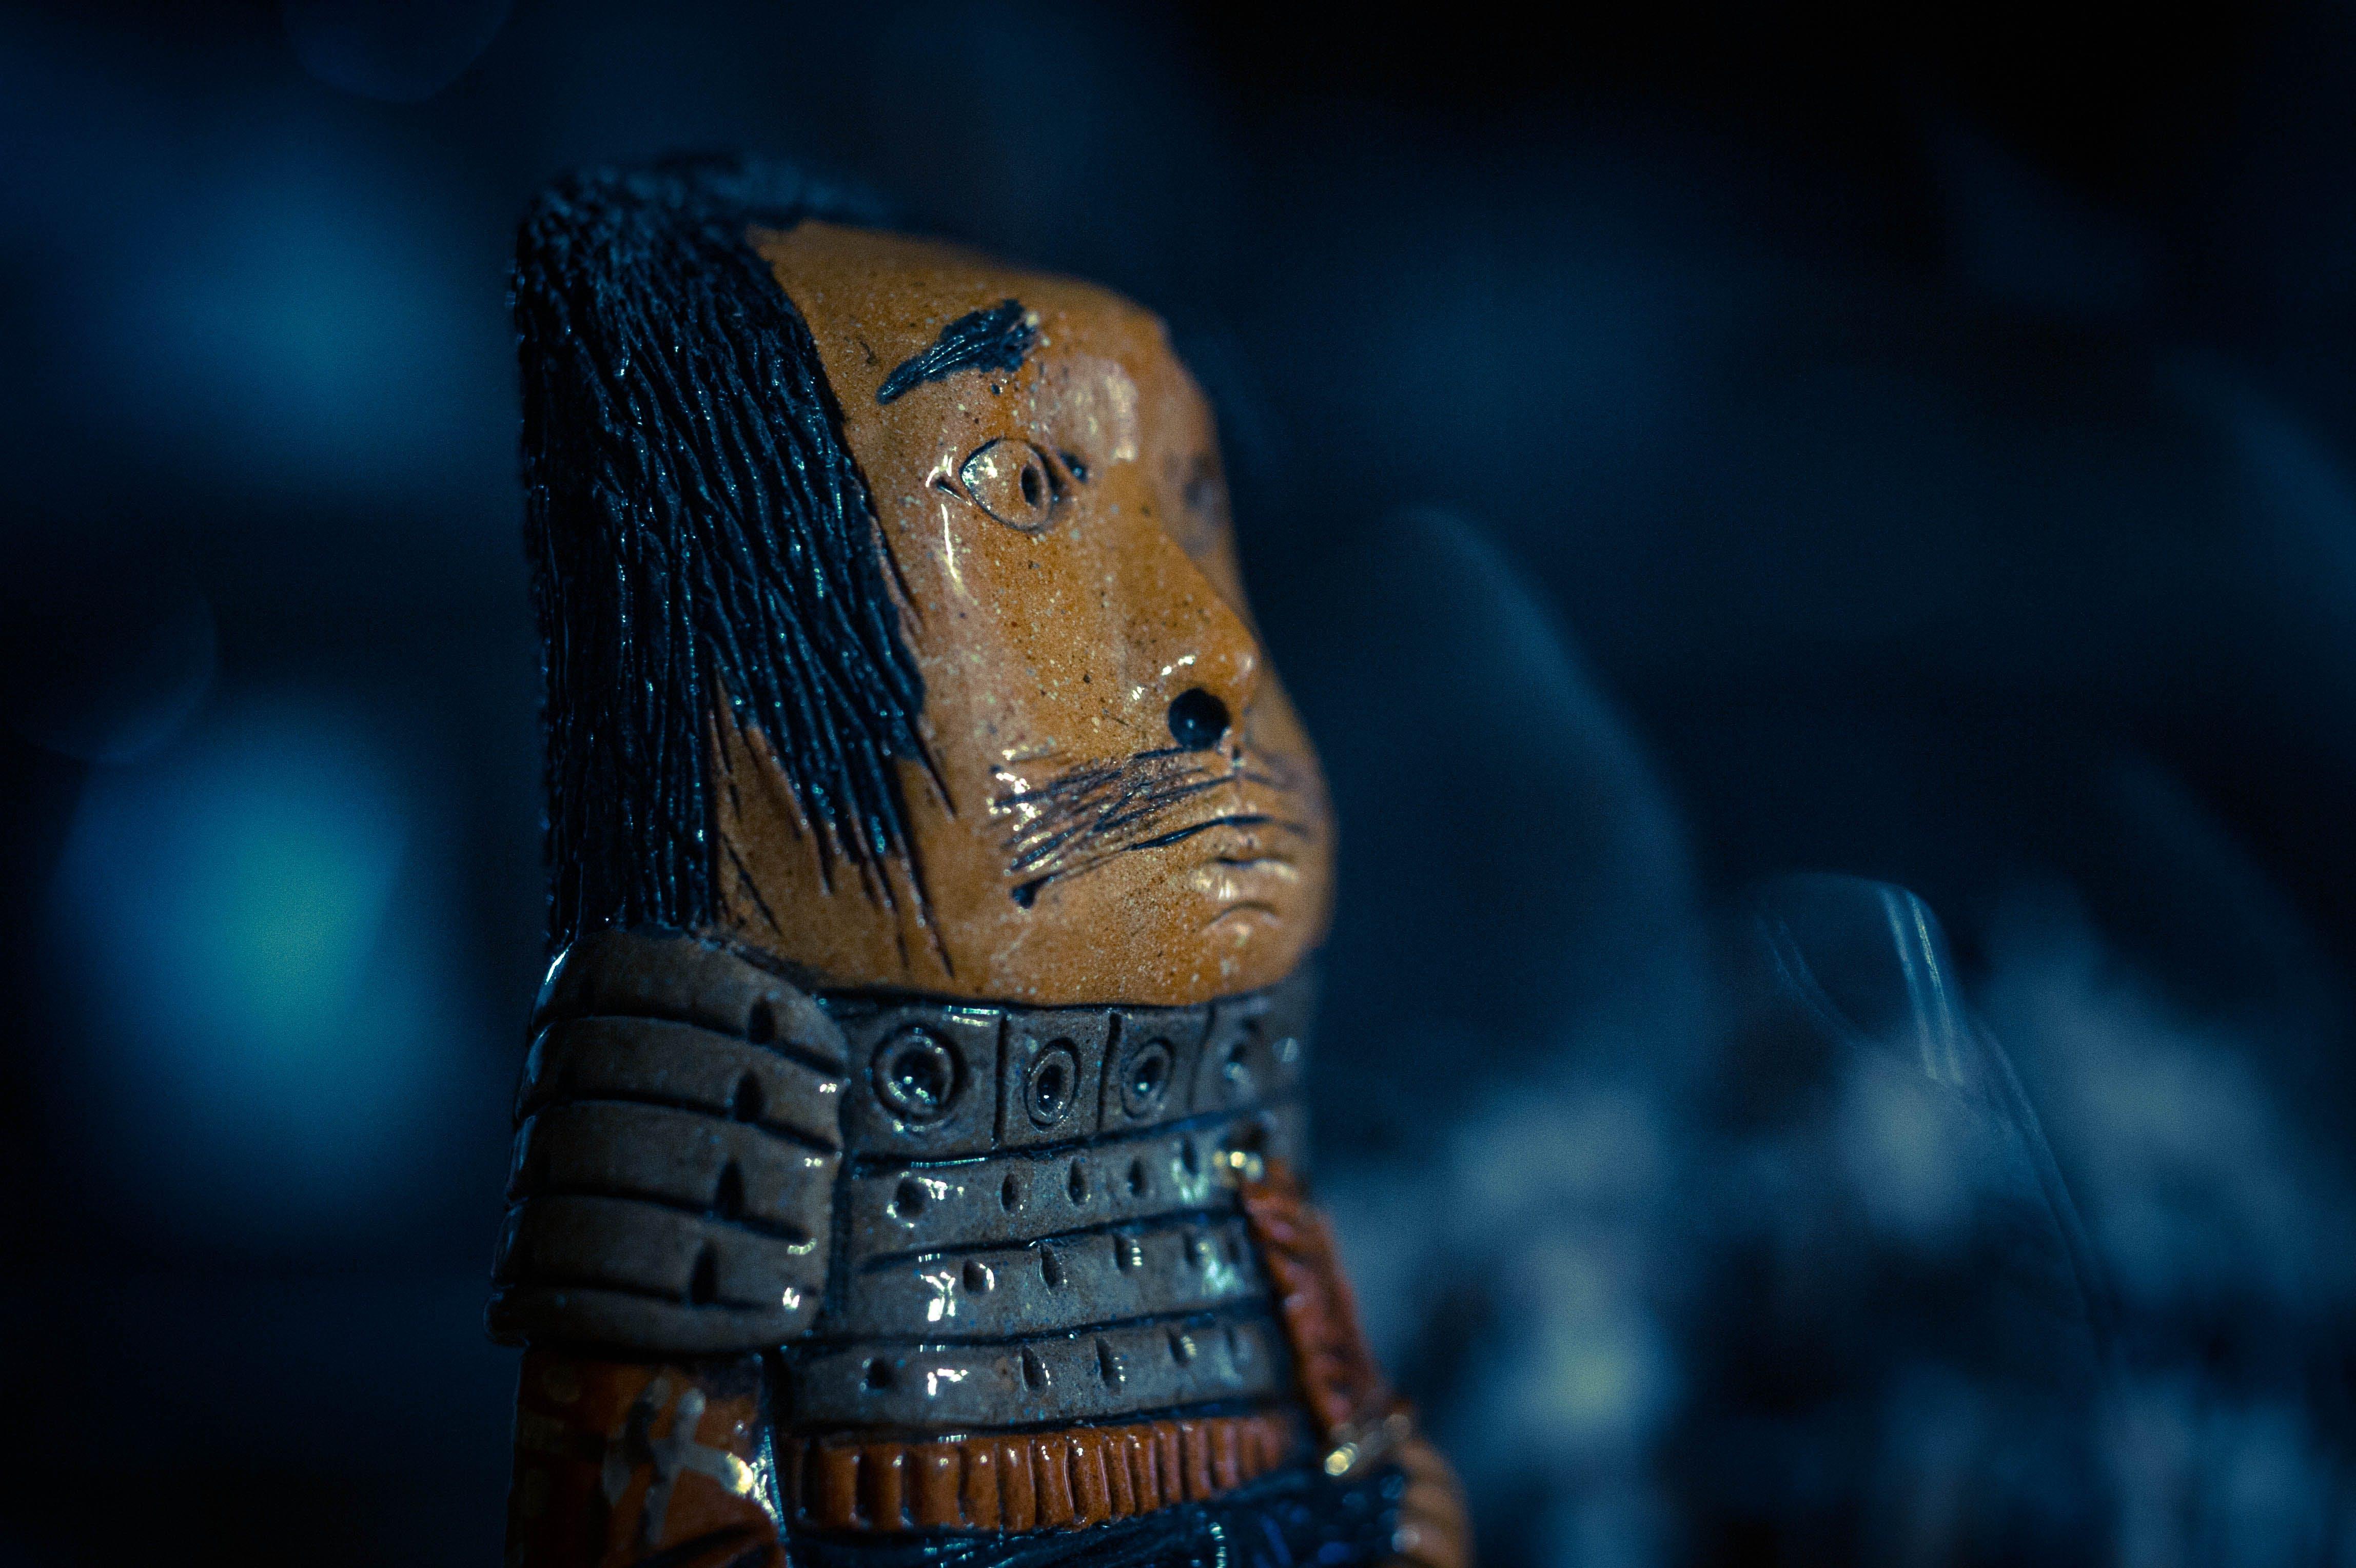 Brown and Gray Warrior Figure Closeup Photo